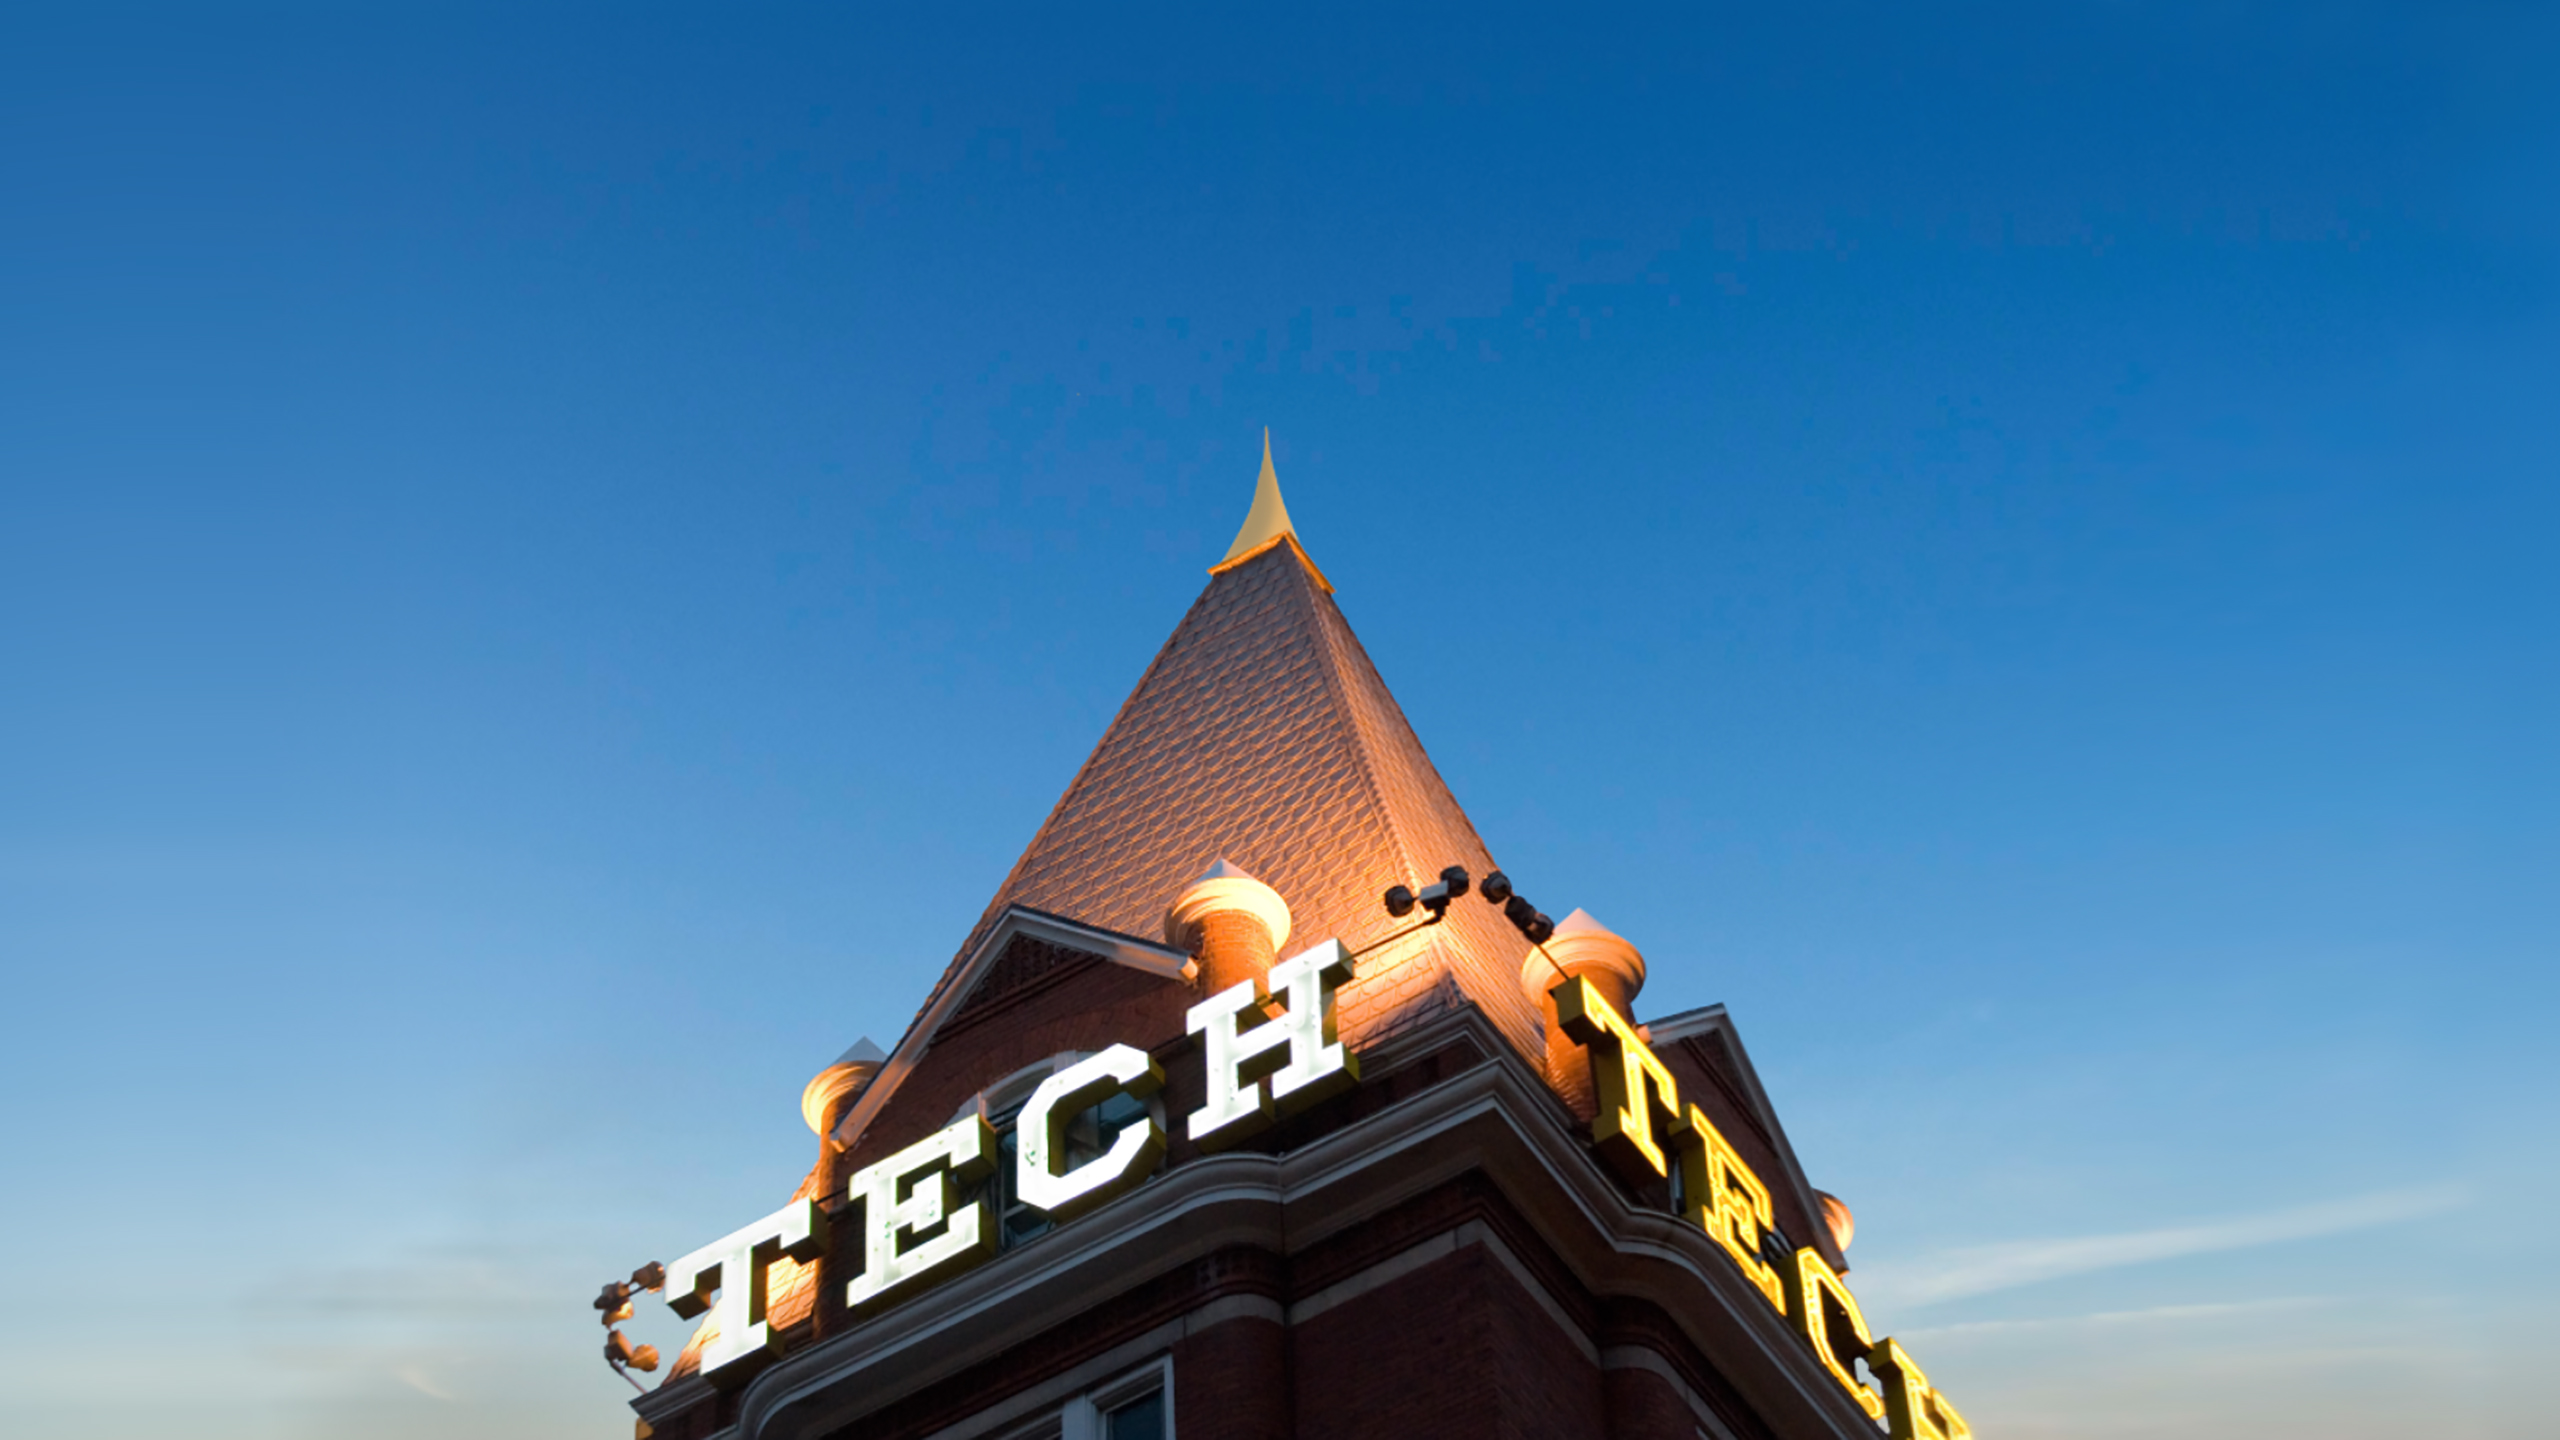 Georgia Tech tower